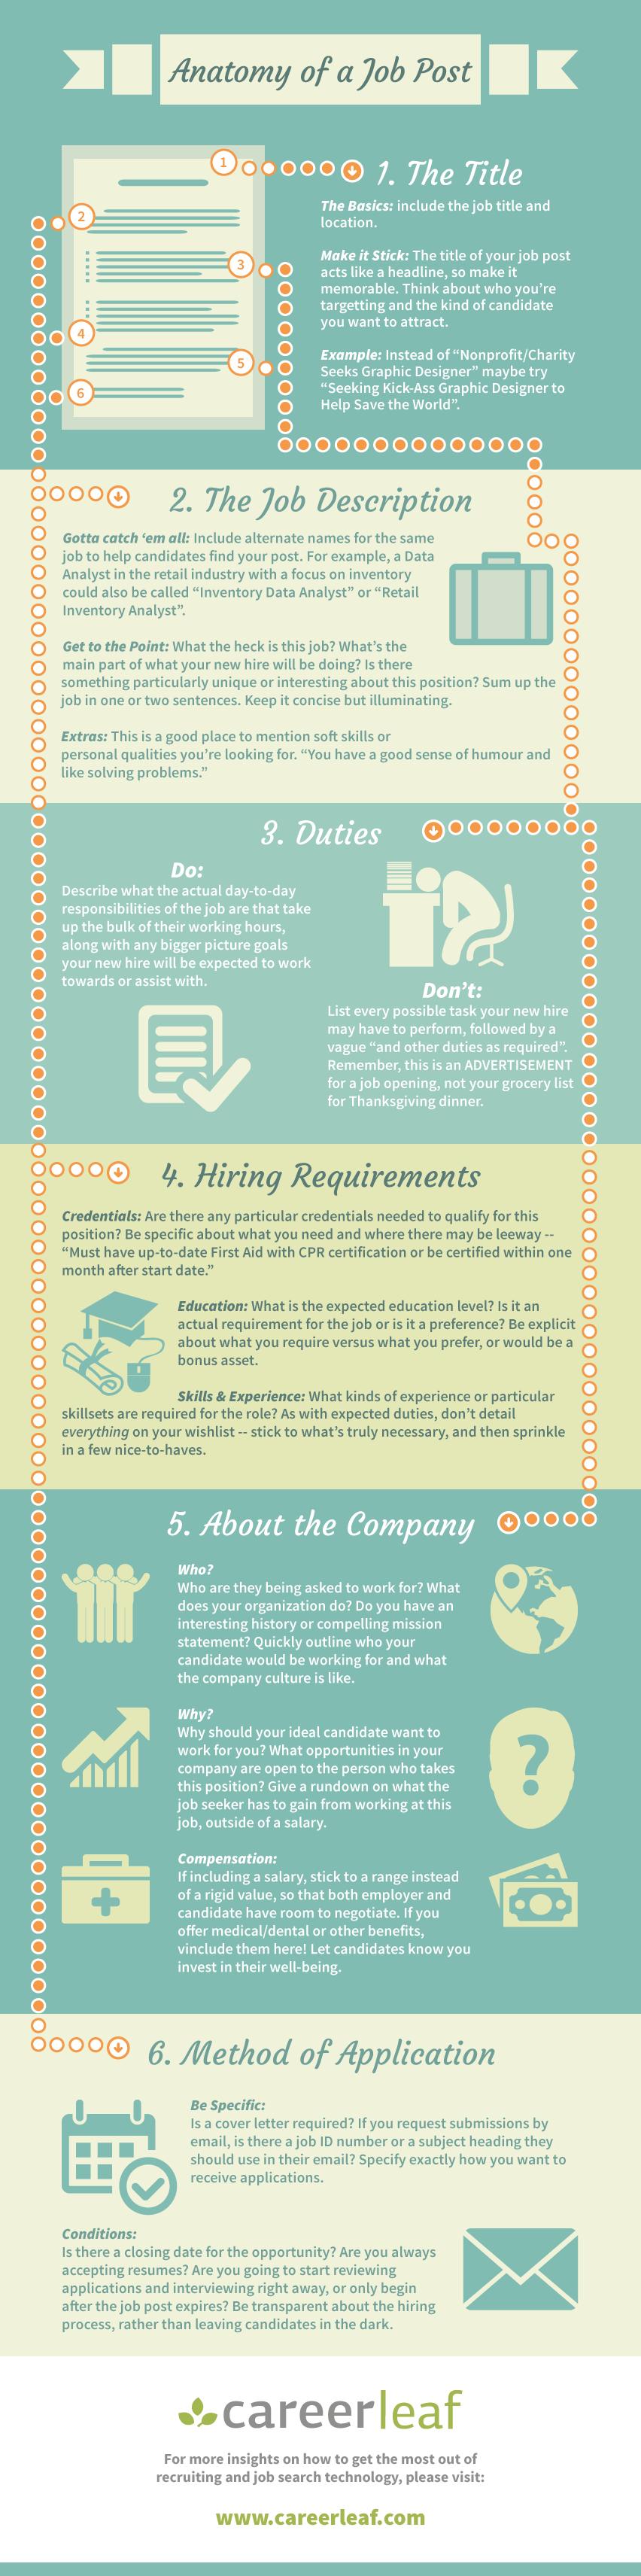 jobpostanatomy-infographic